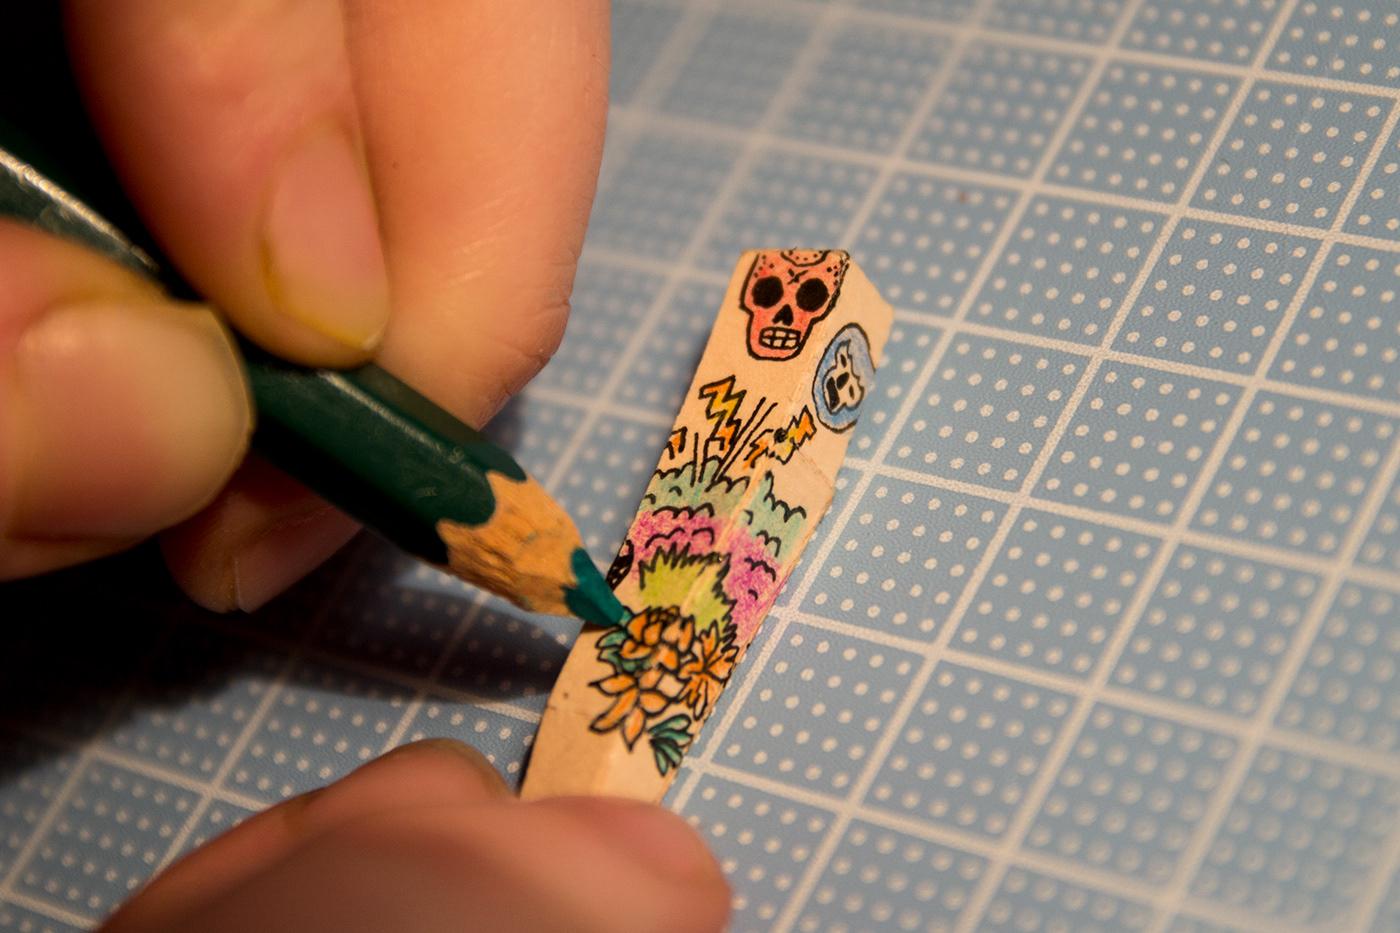 papercraft papelpipol paperpeople papertoy lowpoly guardabosques carolinasilvero tiempolibre Muñequitos